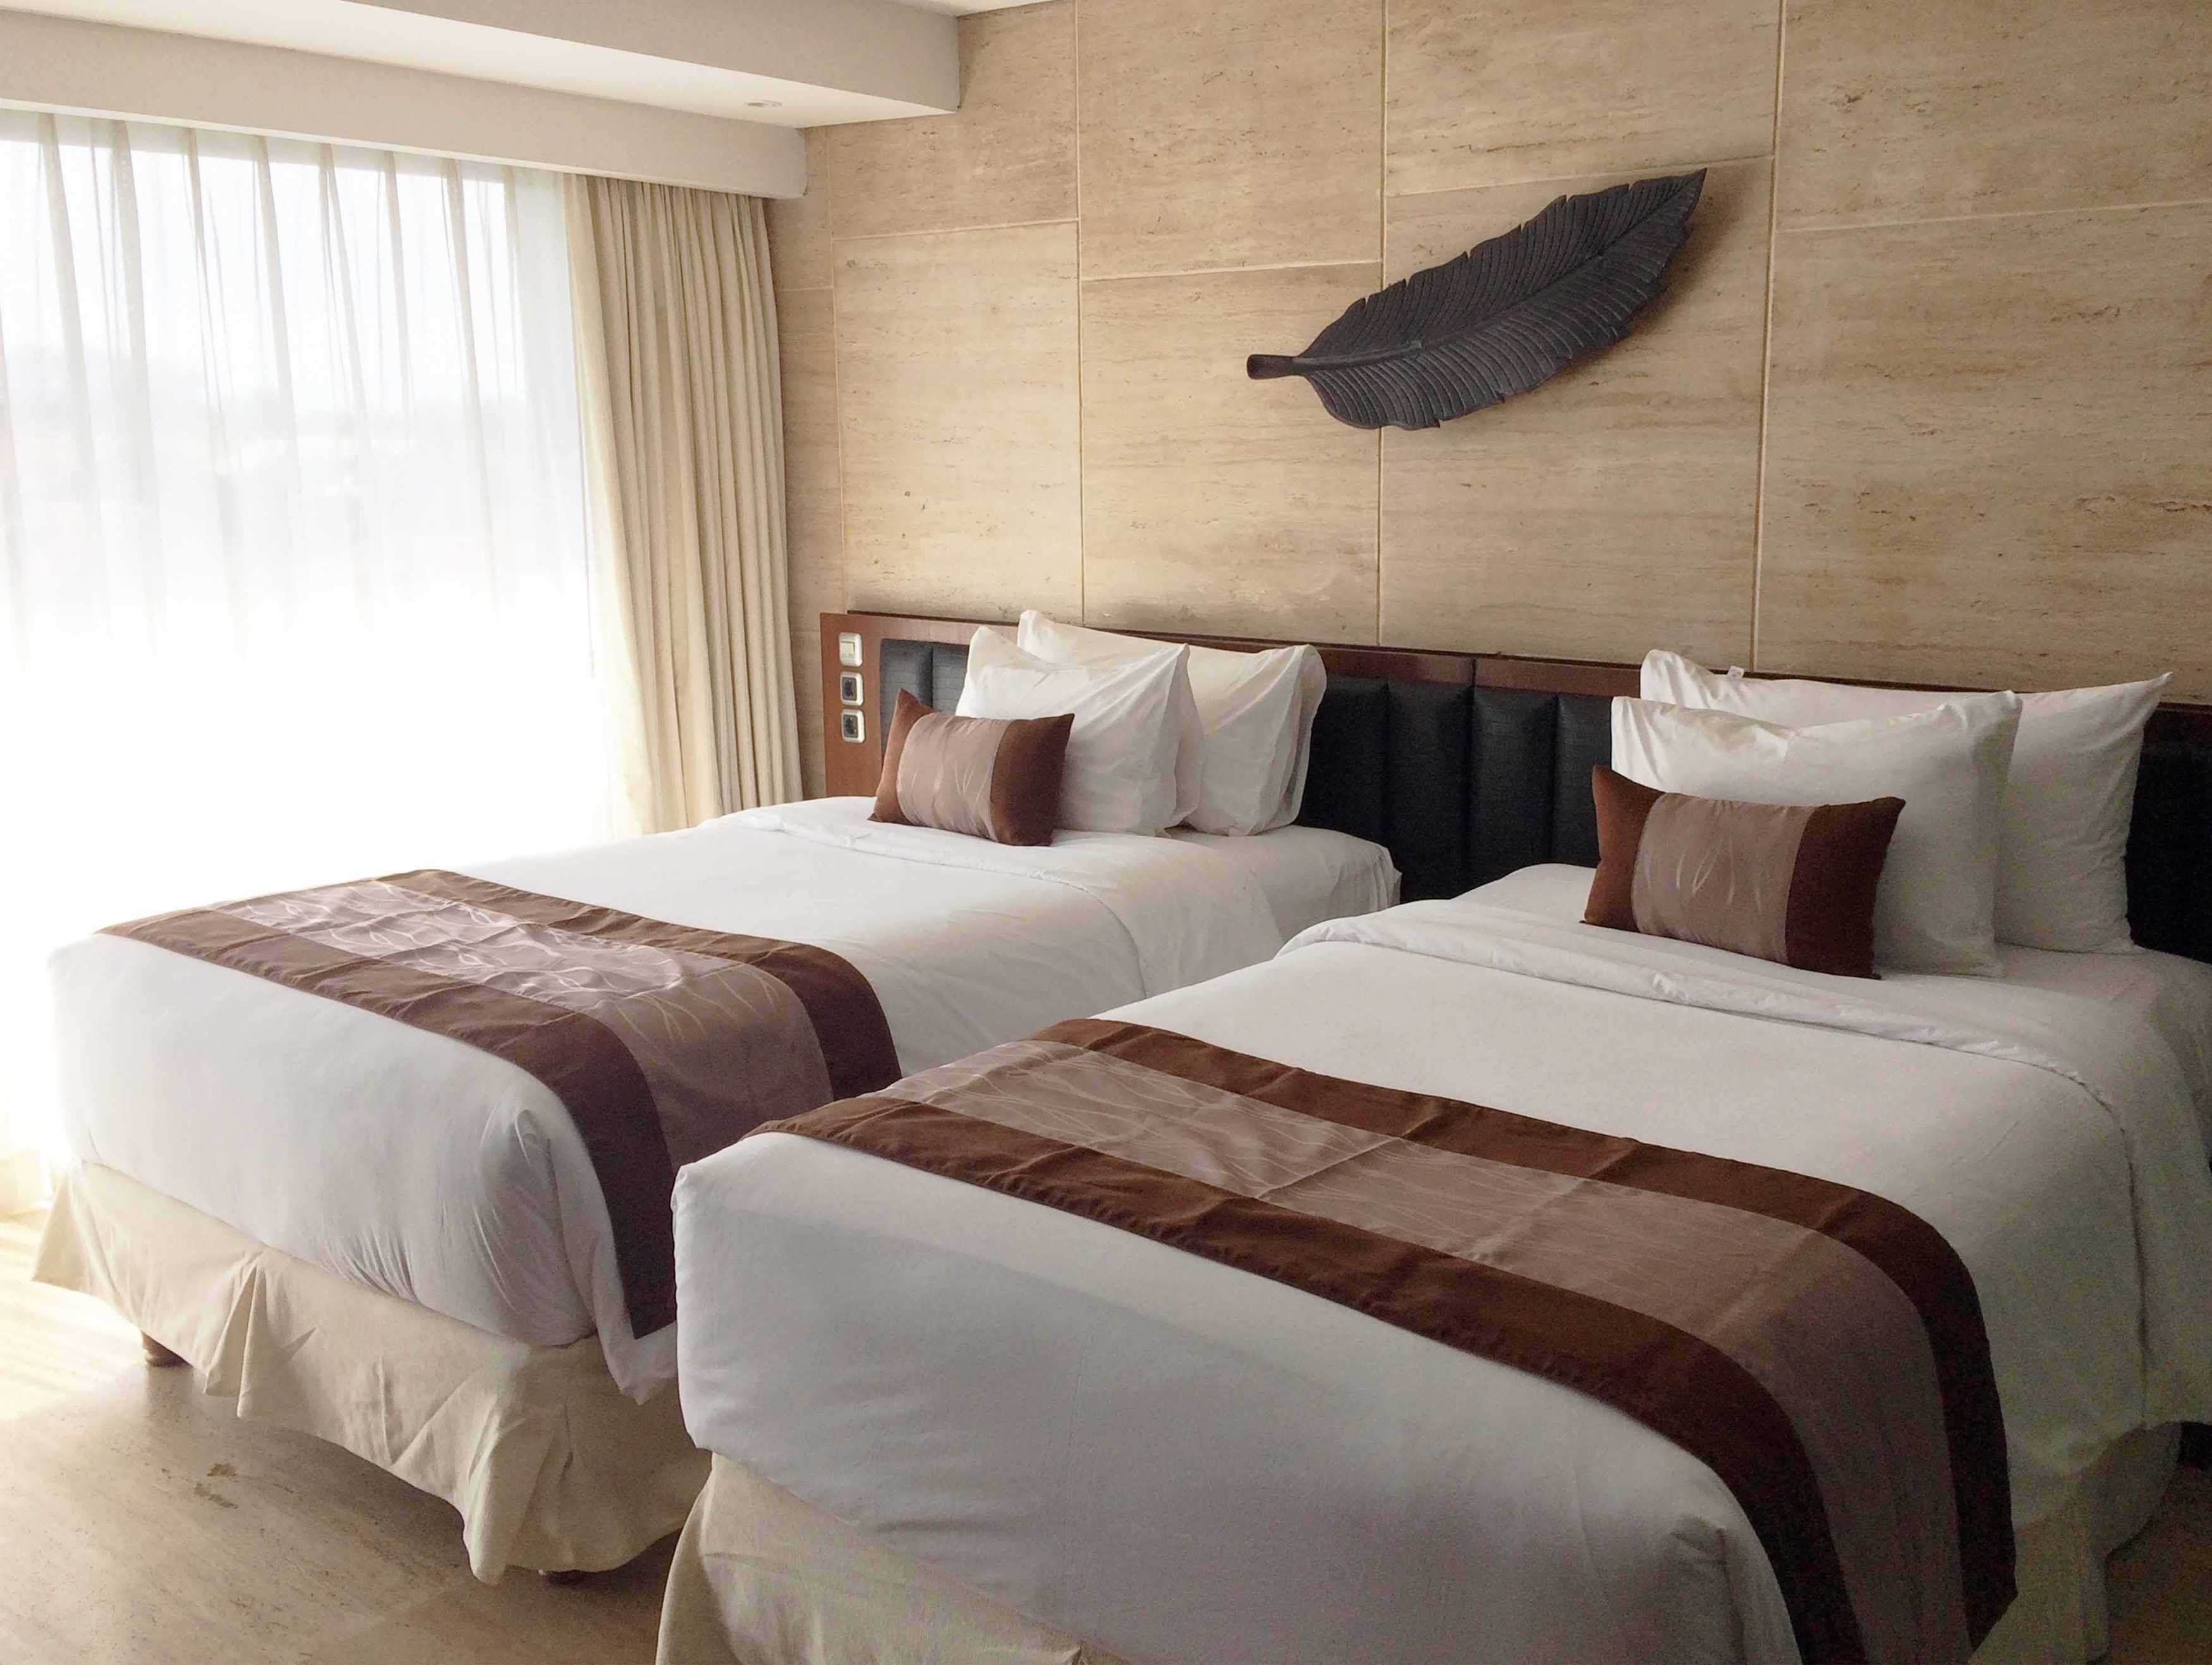 Monokroma Architect Golden Tulip Devinz Skyvilla Seminyak, Bali Seminyak, Bali Twin Bed Room Modern  29934